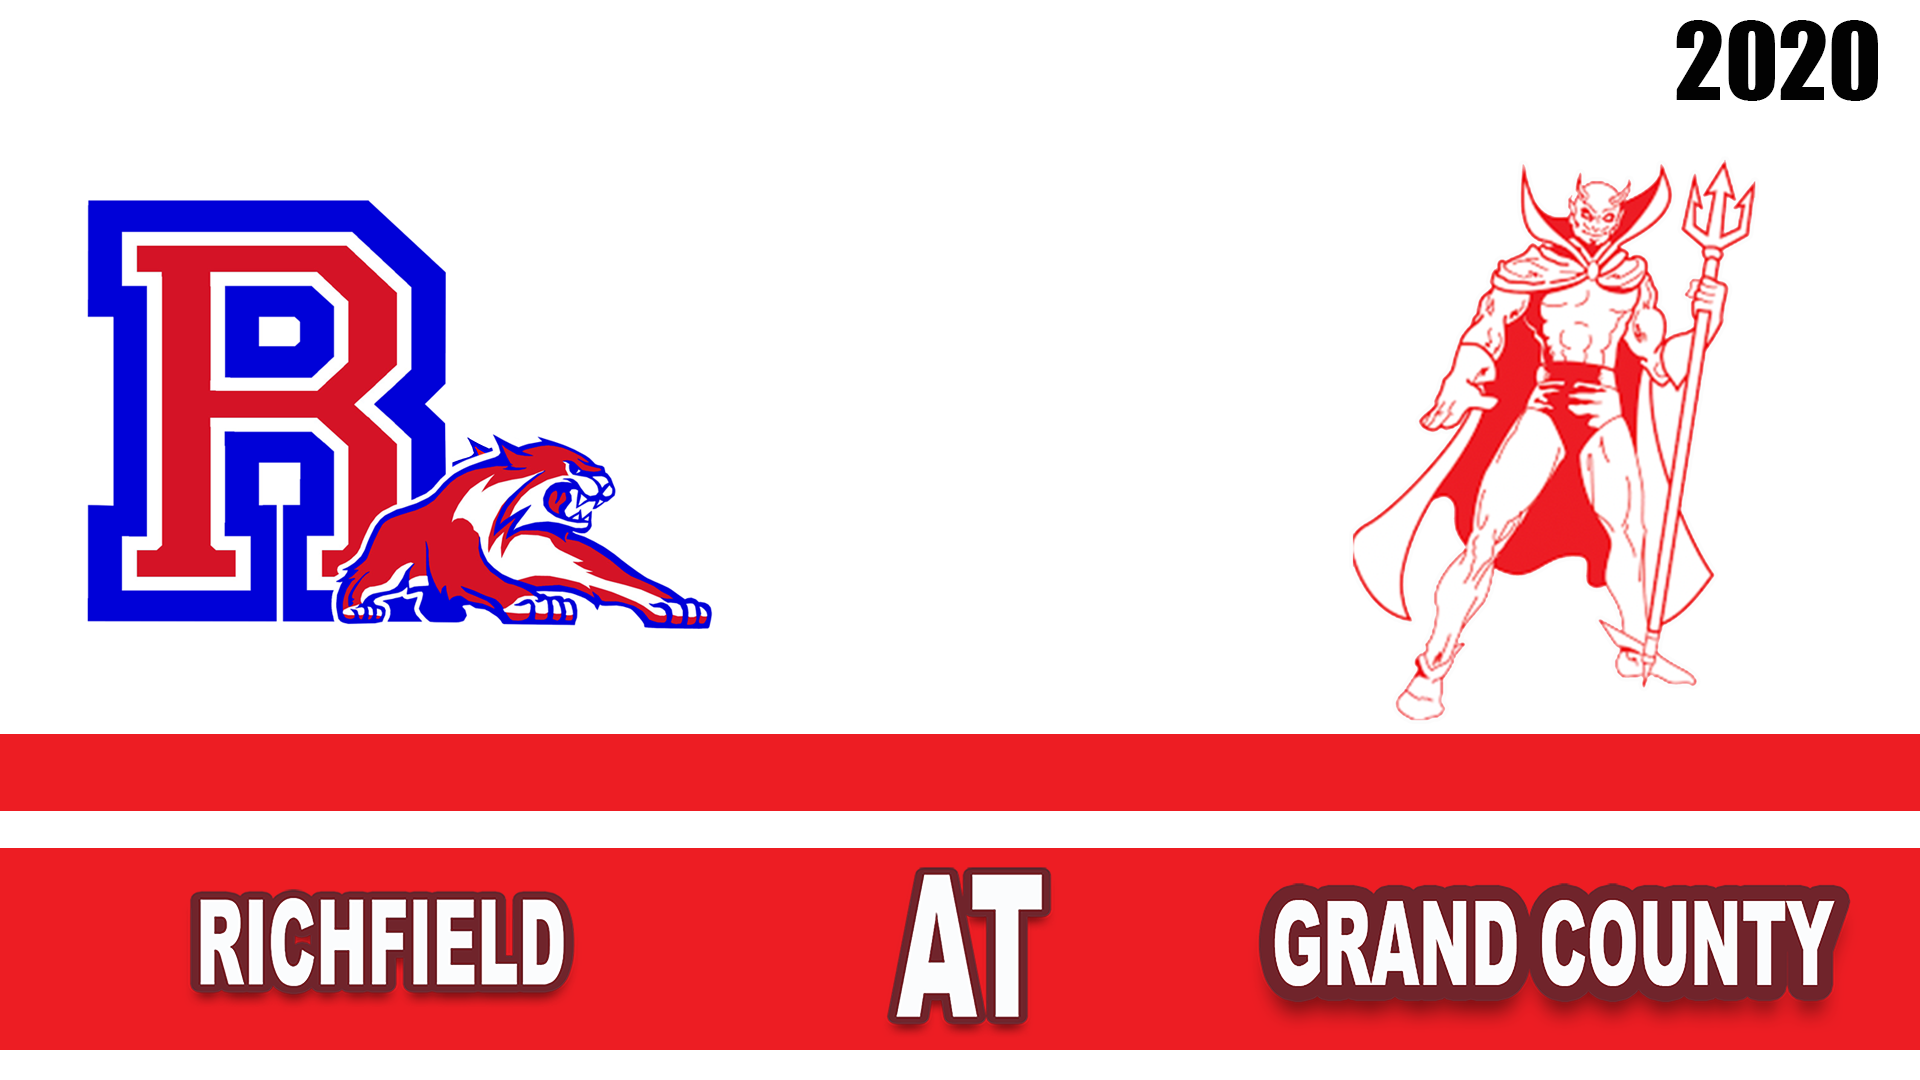 Richfield at Grand